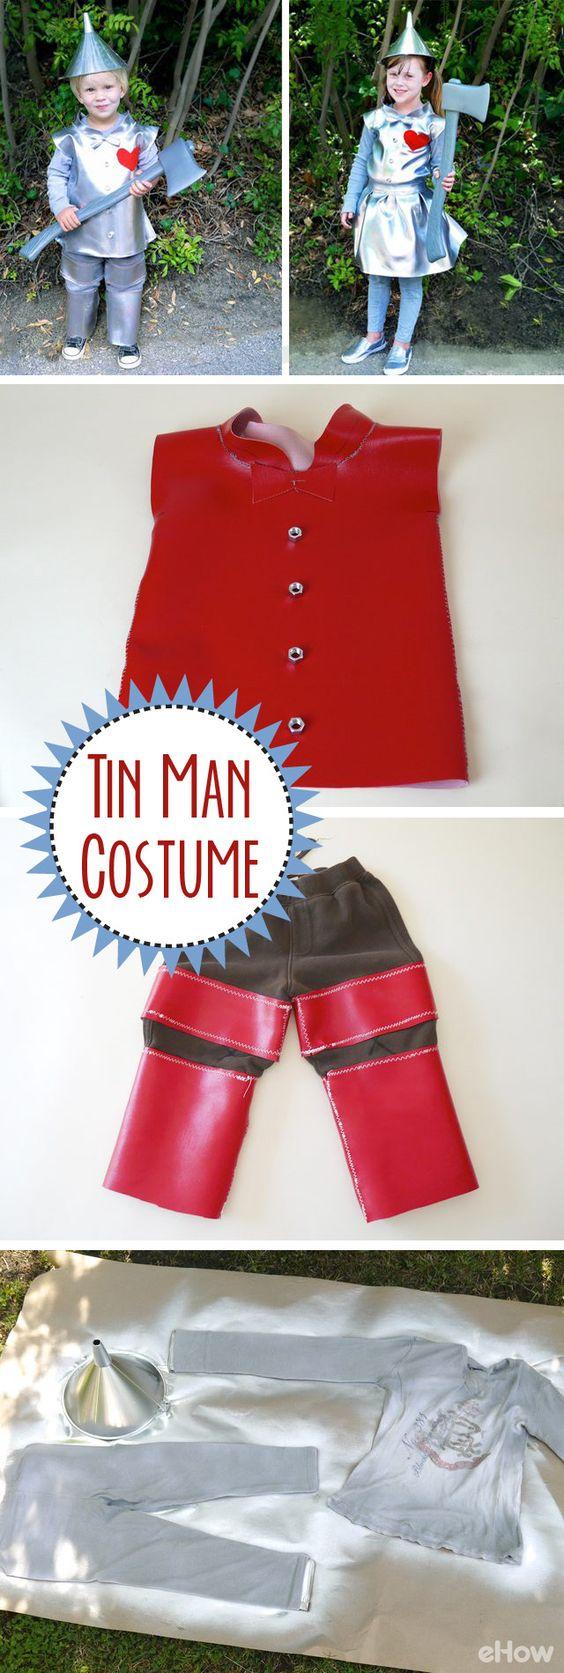 Tin Man Wizard of Oz Costume.